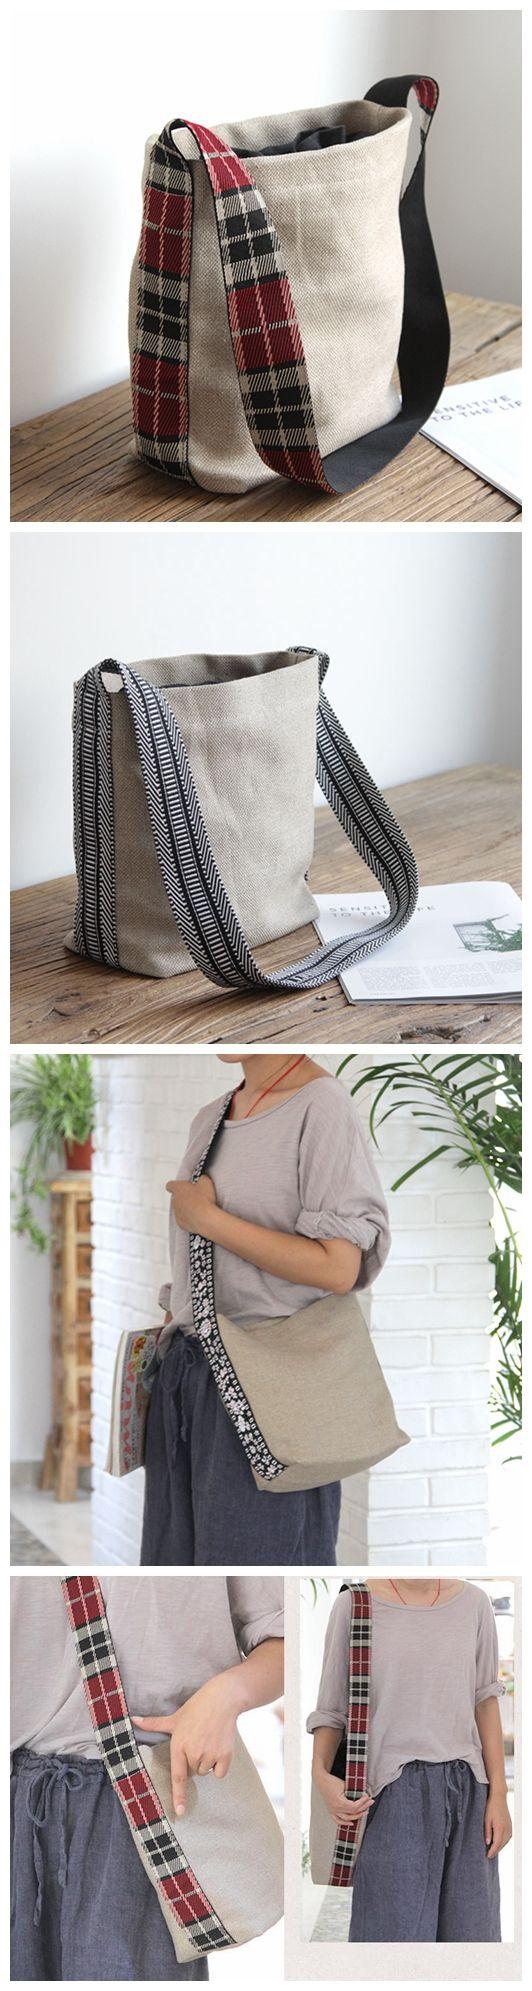 Canvas Crossbody Bag, Handmade Bag, Bridesmaid Gift, Casual Daily Canvas Bag, Vintage Bag, Popular Bag, YY022